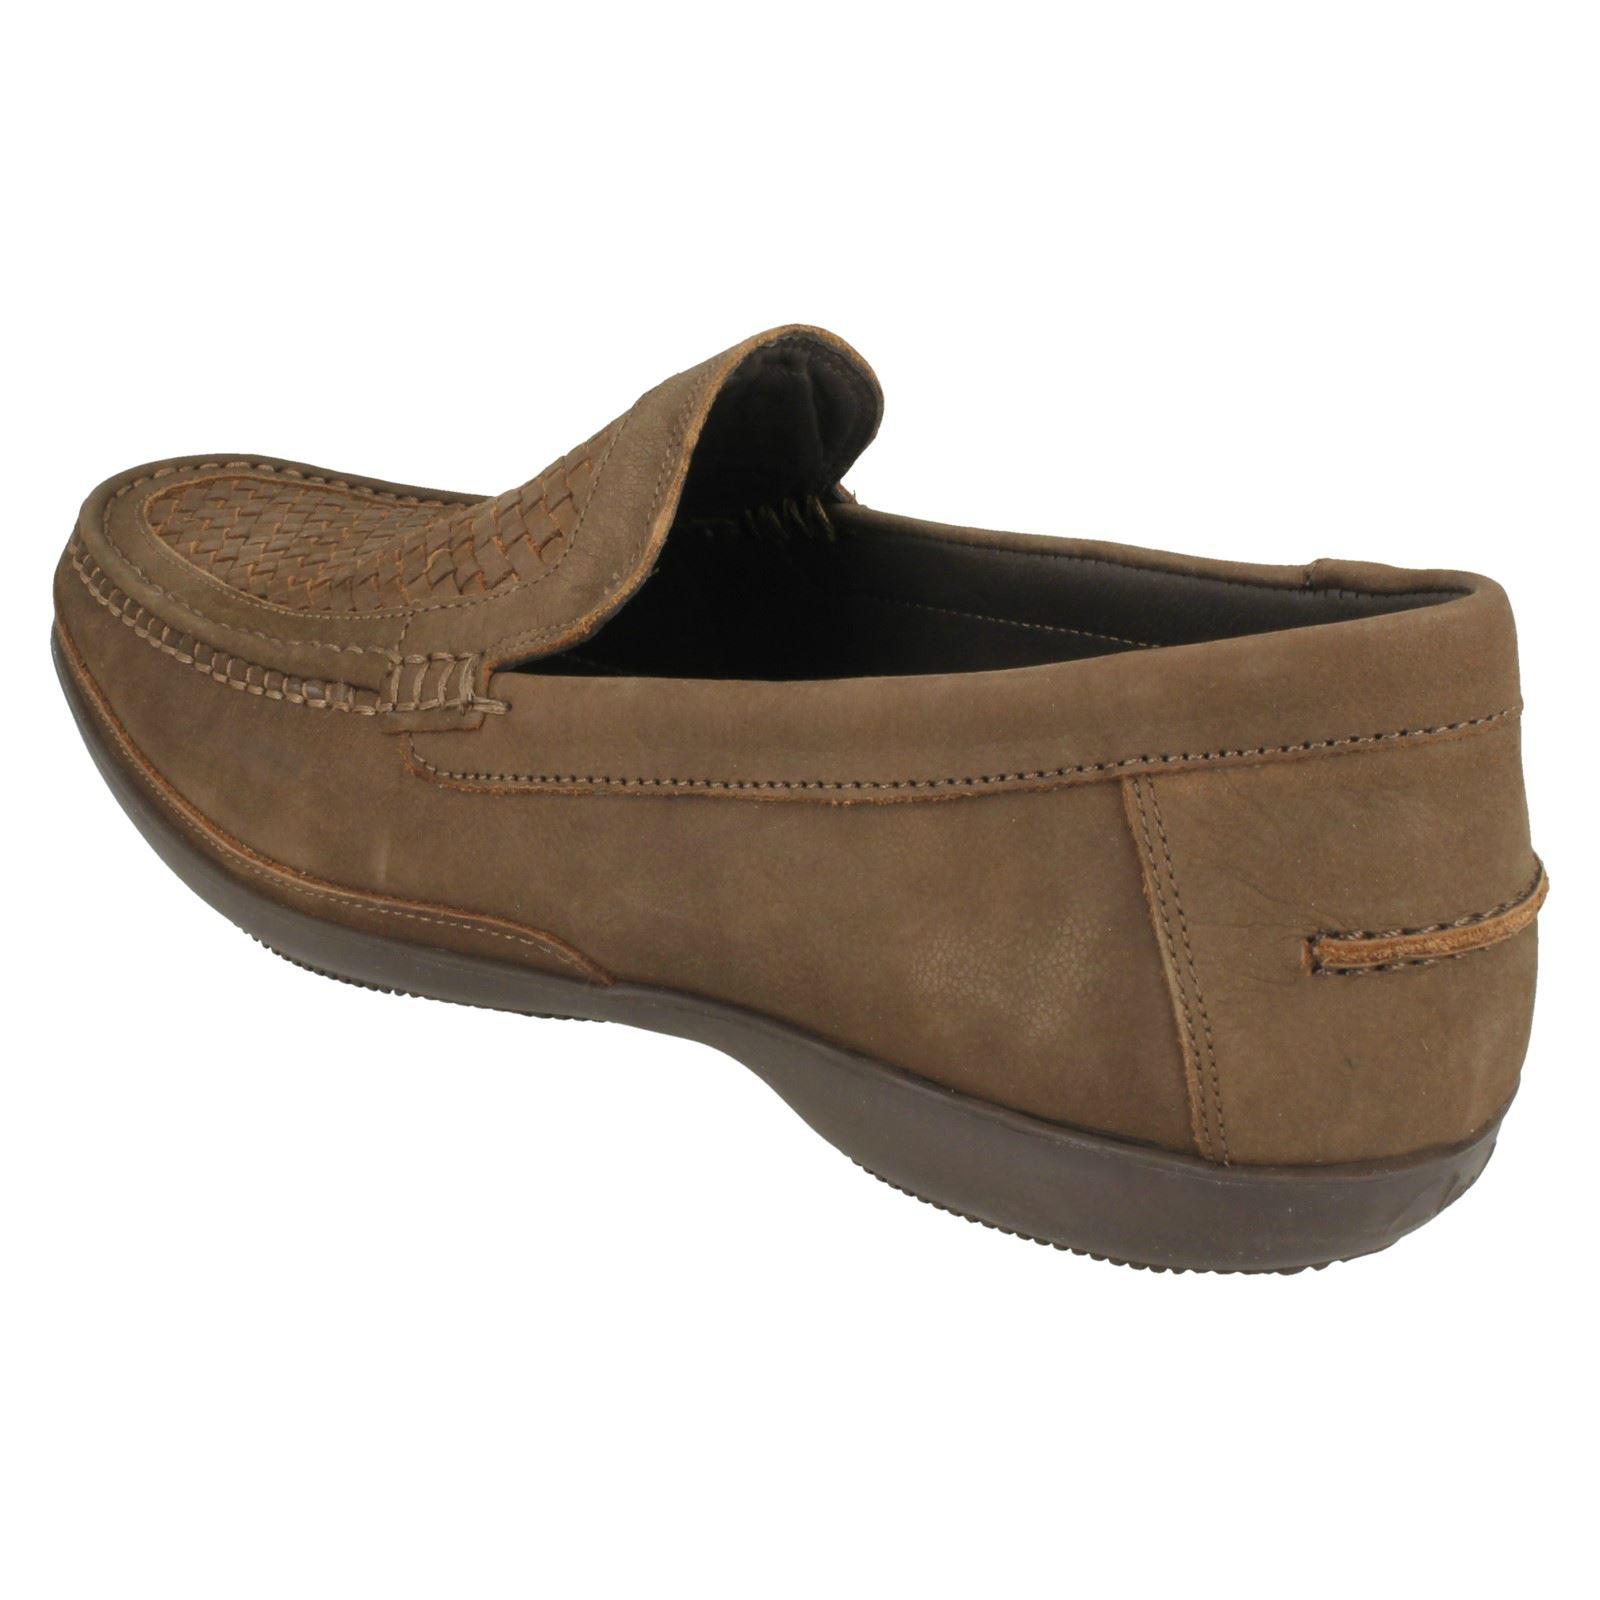 para Finer hombre Clarks Slip On marrón Weave Shoes Formal Walnut 7dRdOWq